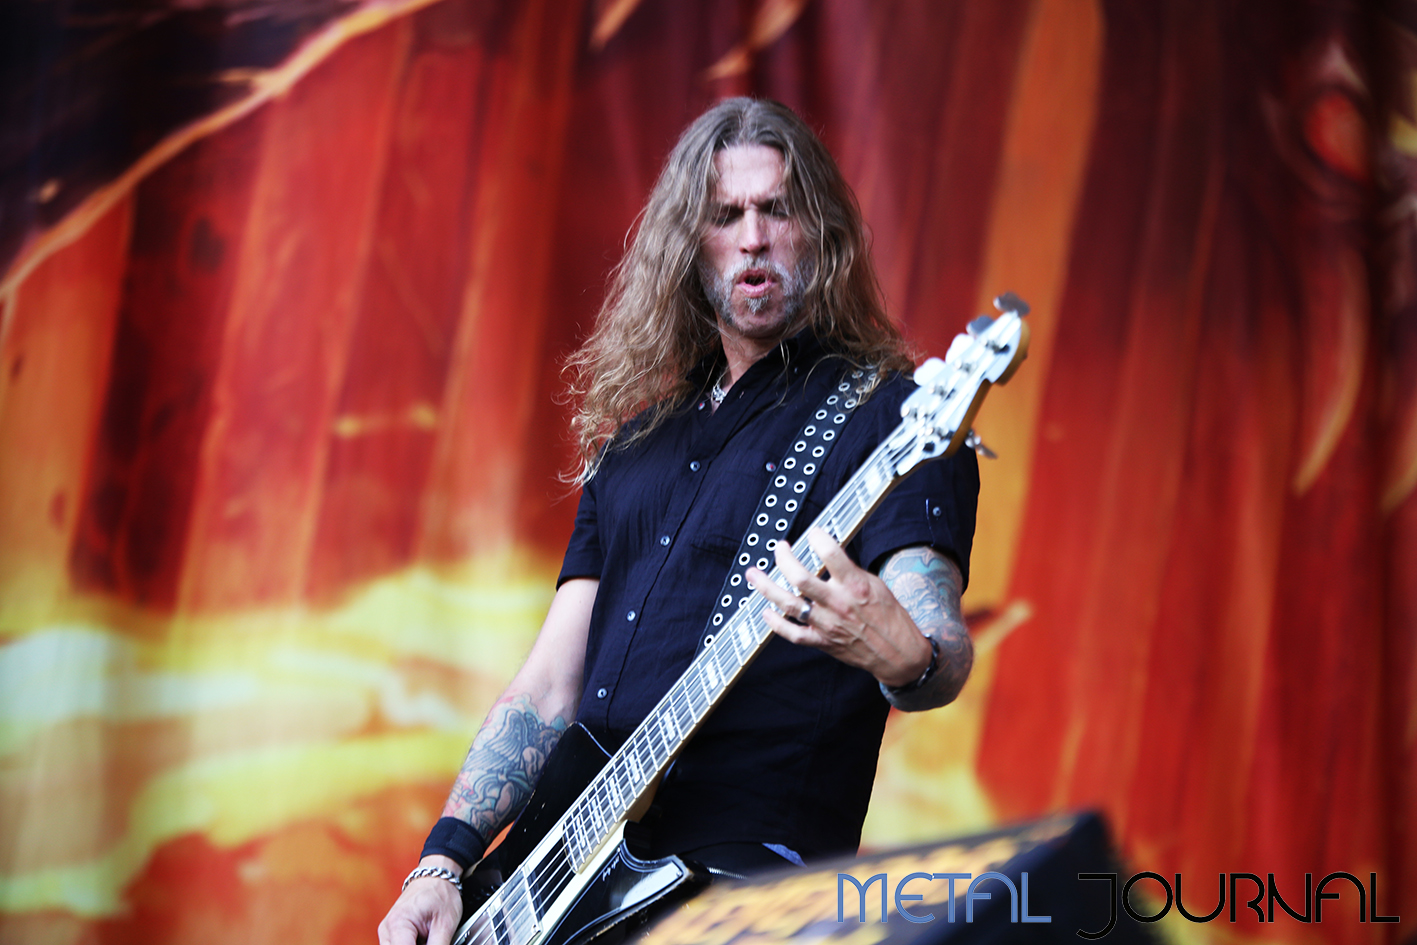 hammerfall - leyendas del rock 2019 metal journal pic 6